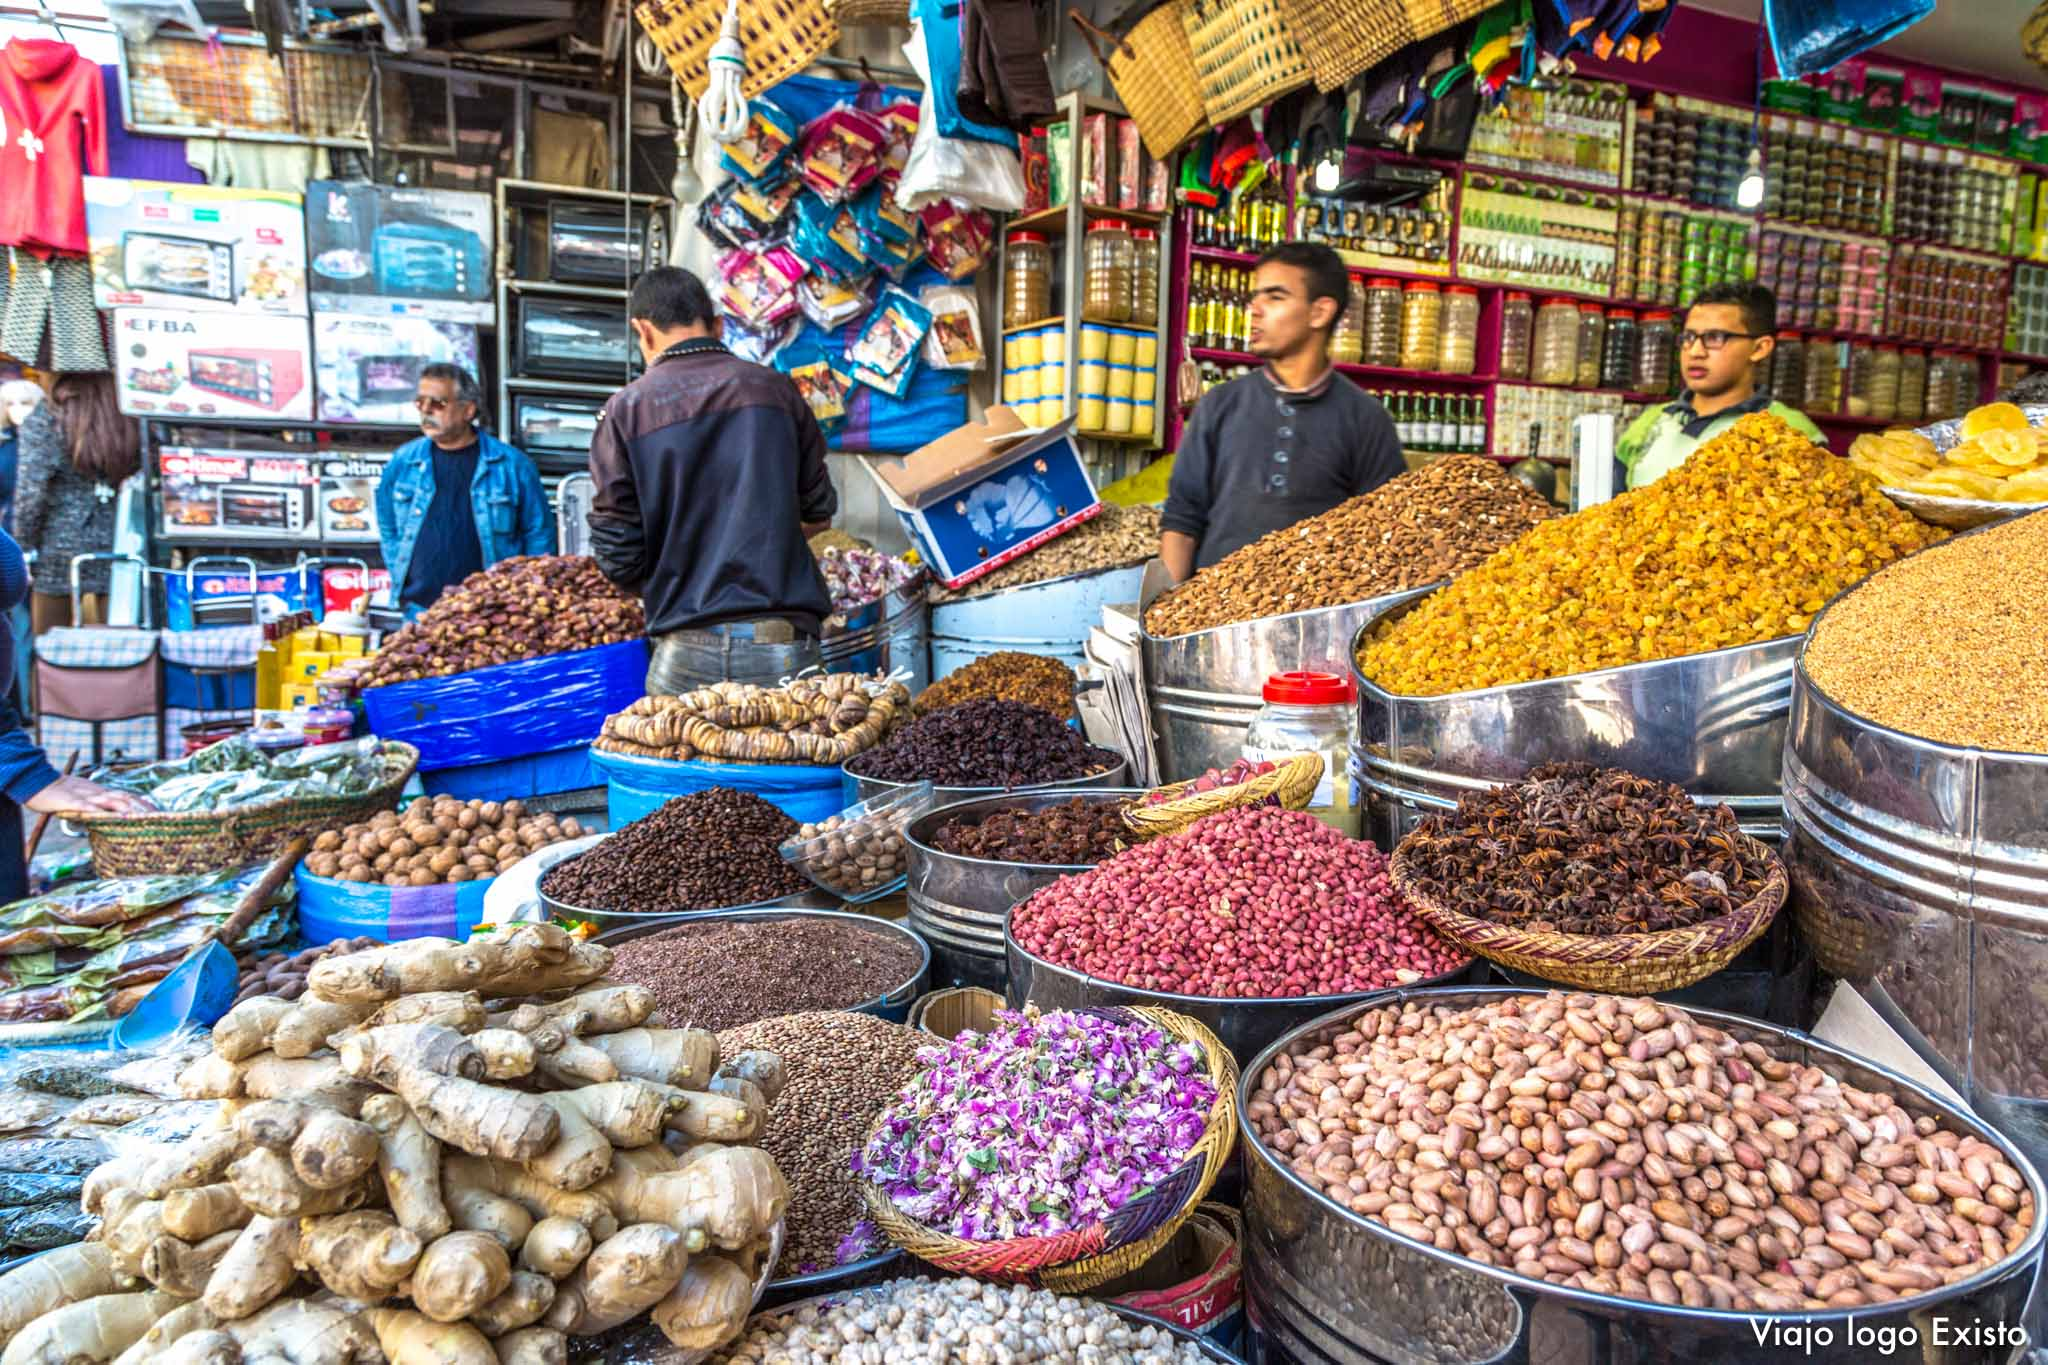 Marrocos - Norte da África